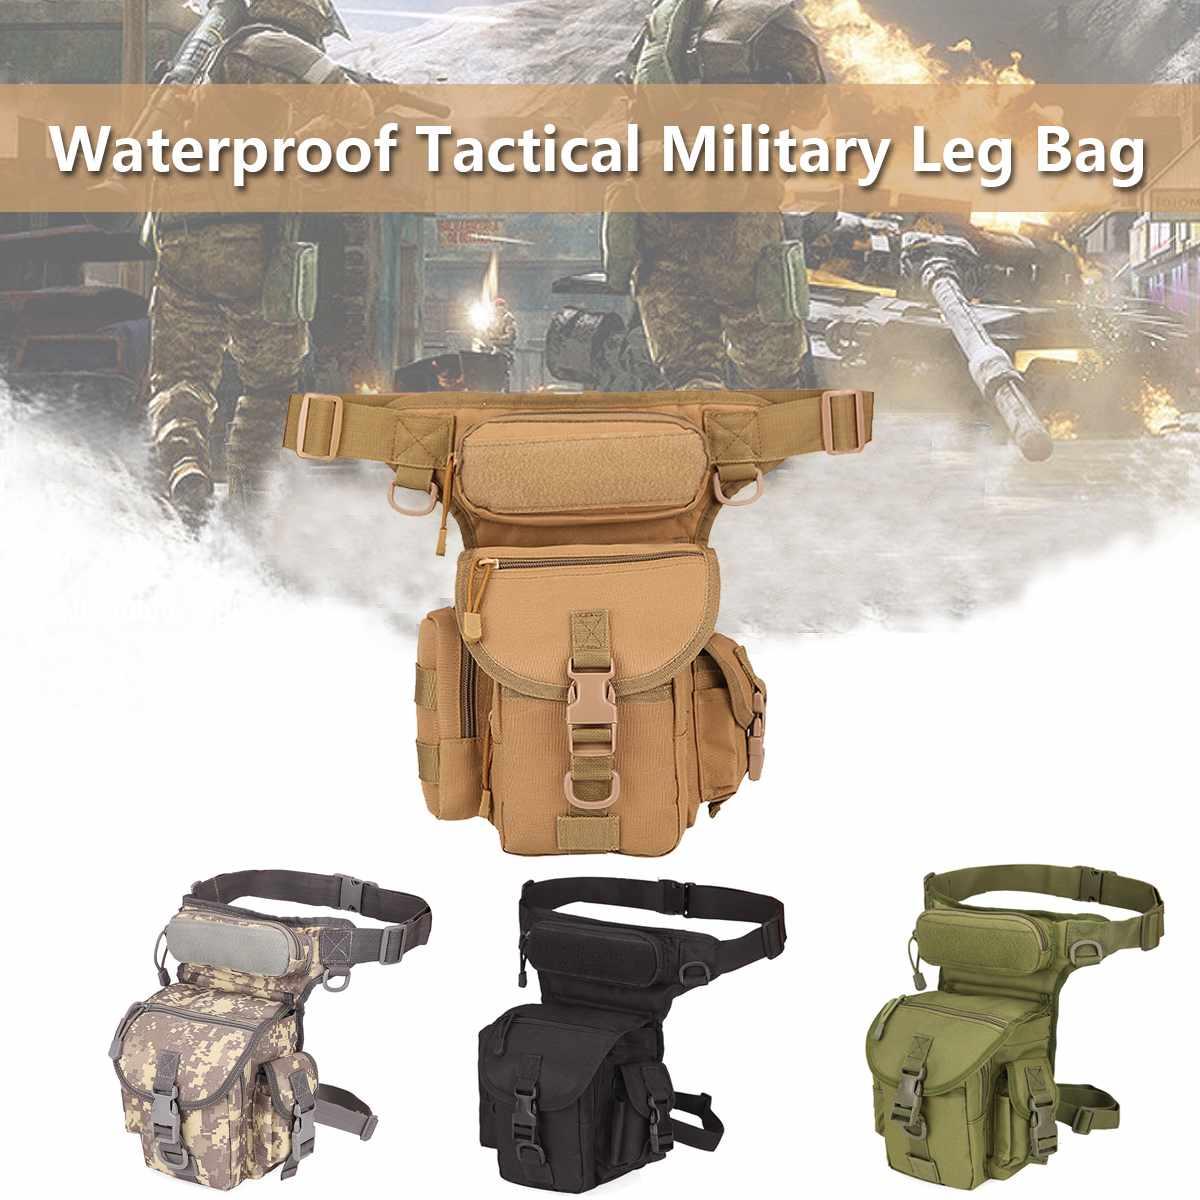 NEW Tactical Waist Bag Drop Leg Bags Tool Camping Hiking Trekking Military Shoulder Saddle Oxford Cloth Multi-function Pack